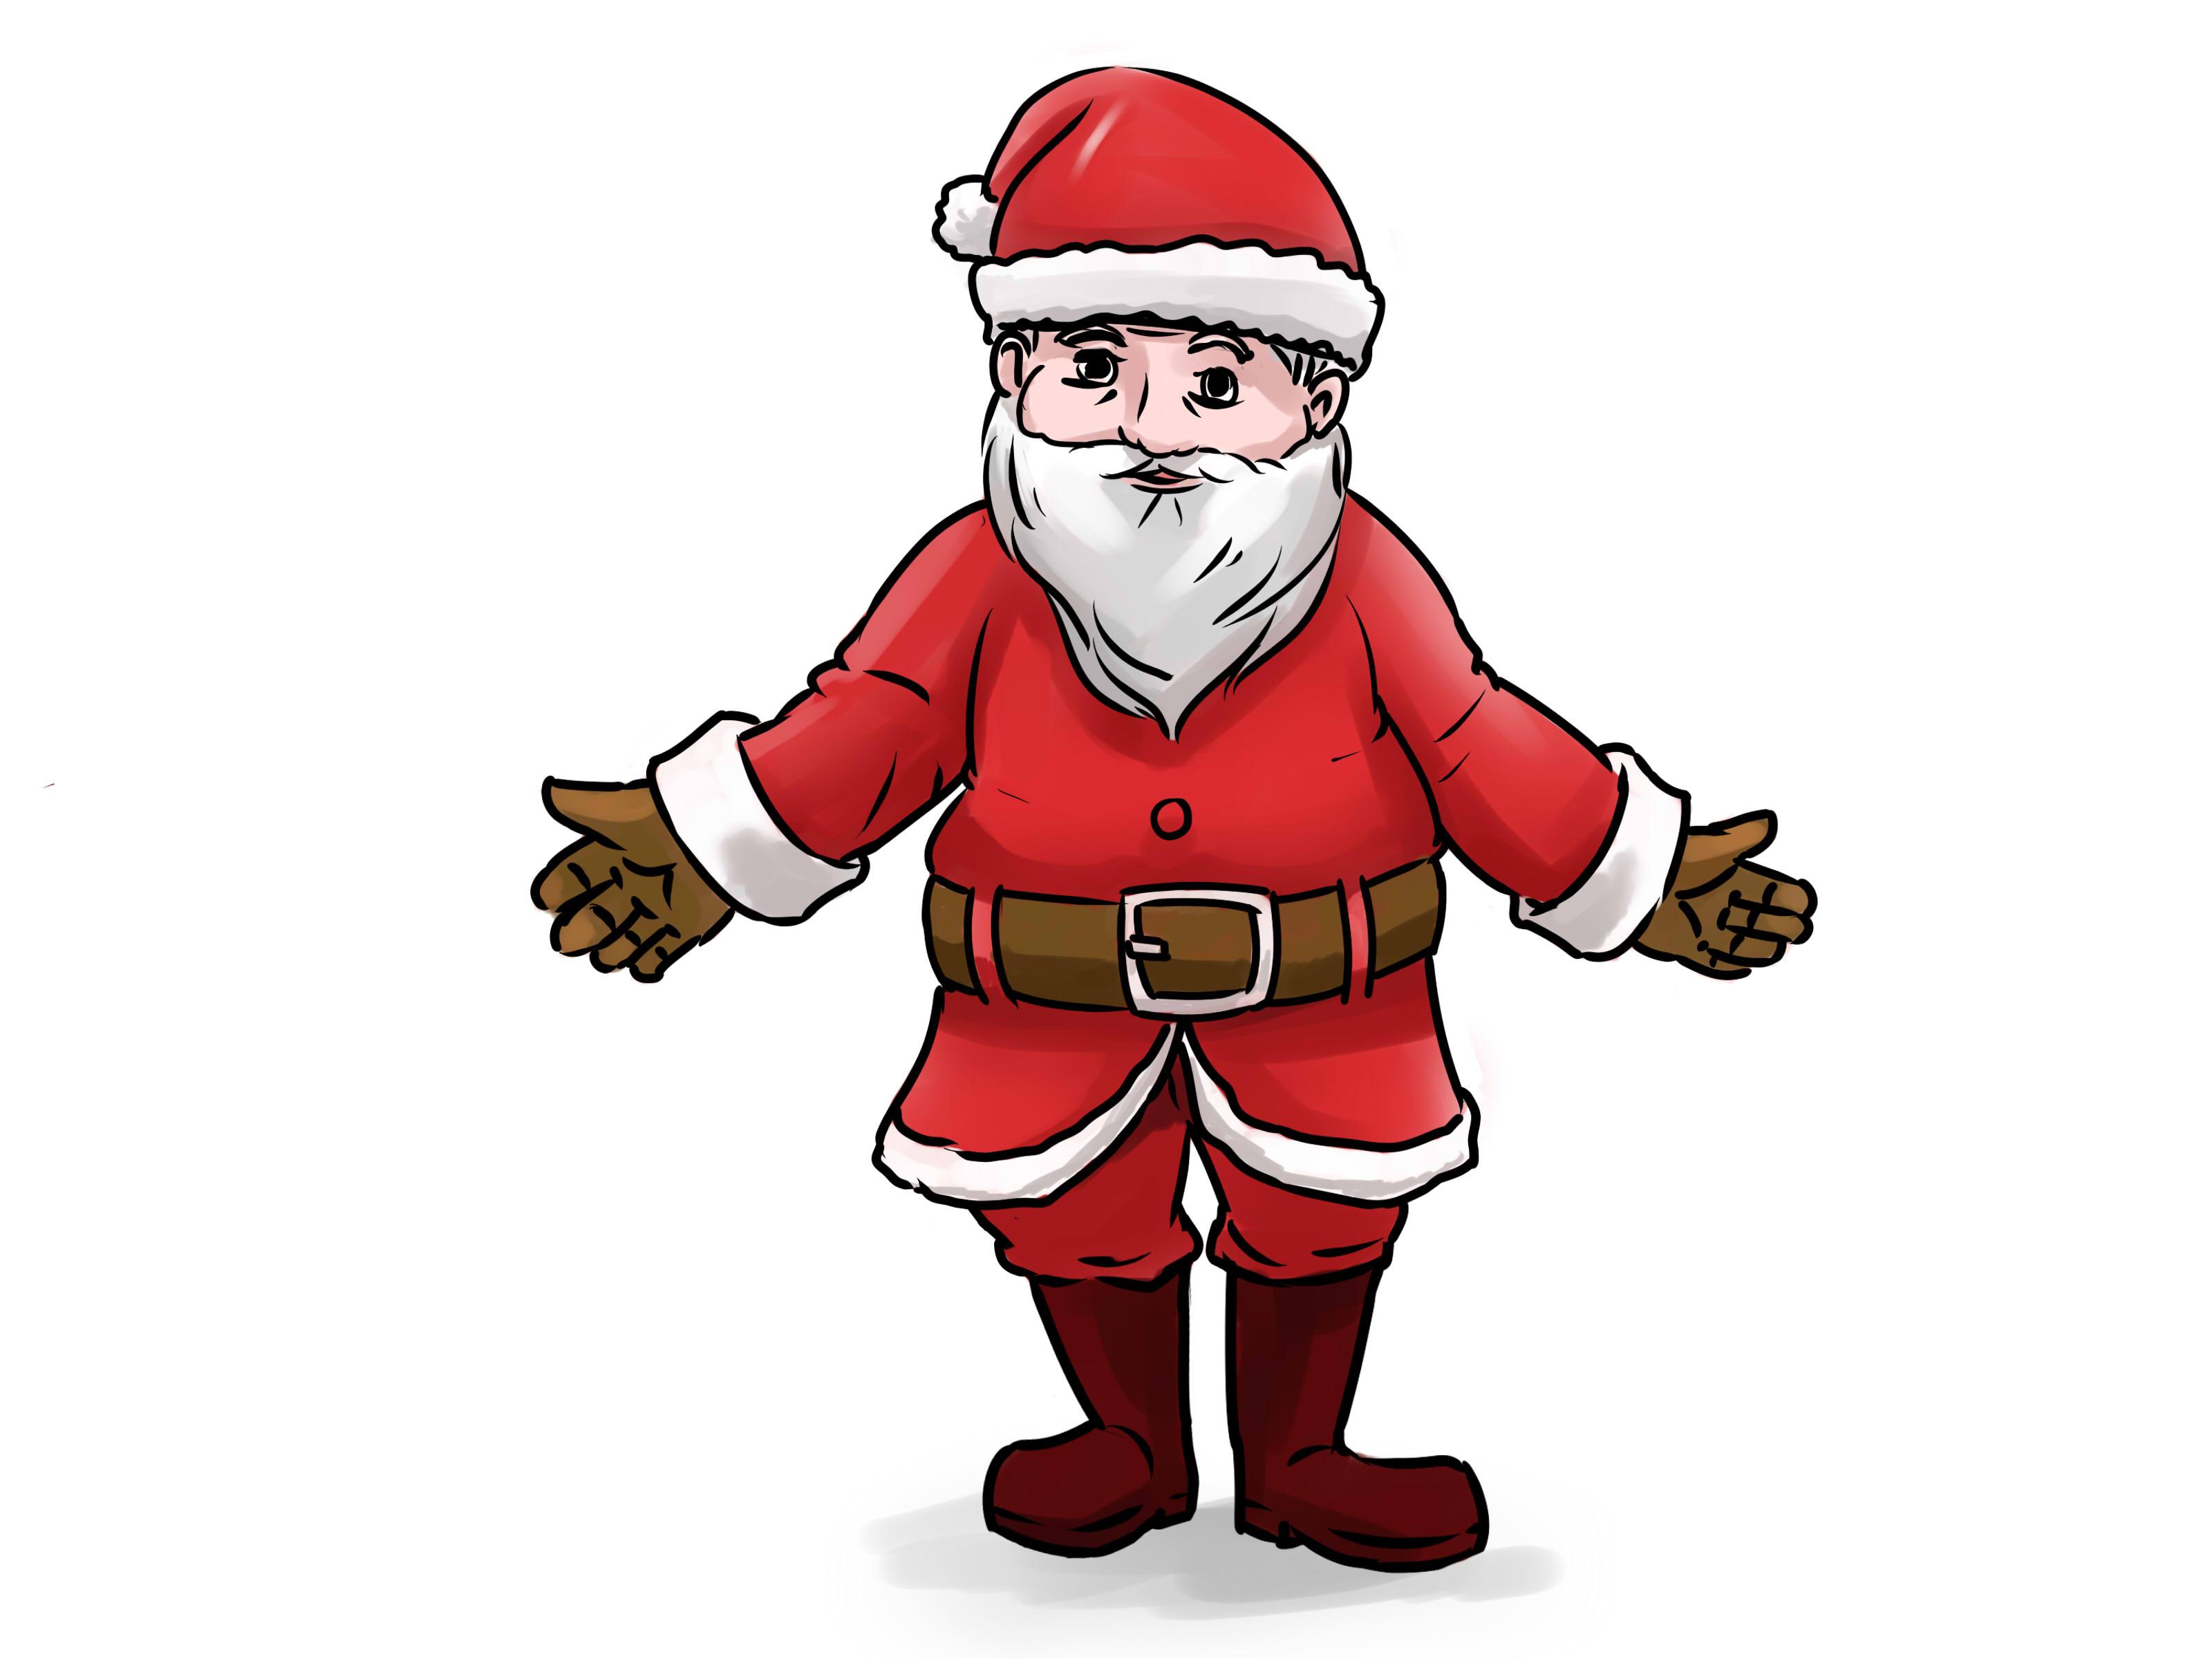 Drawn santa easy draw Santa Santa 14 step Claus